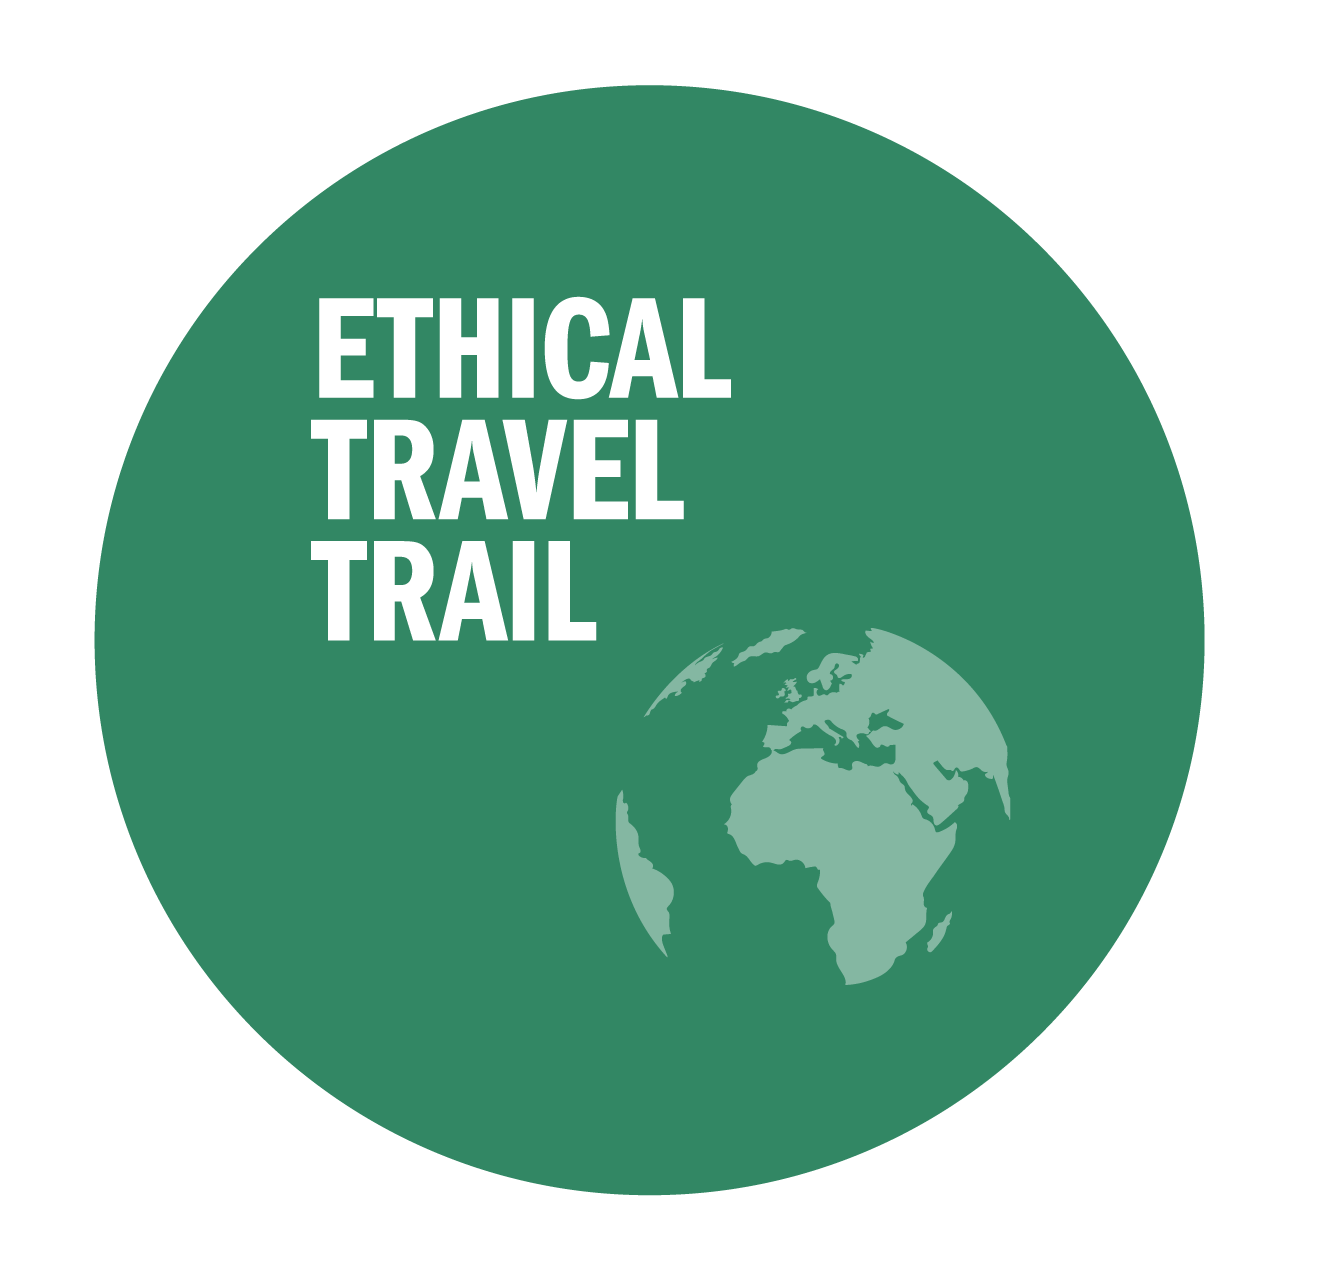 Ethical Travel Trail Logo